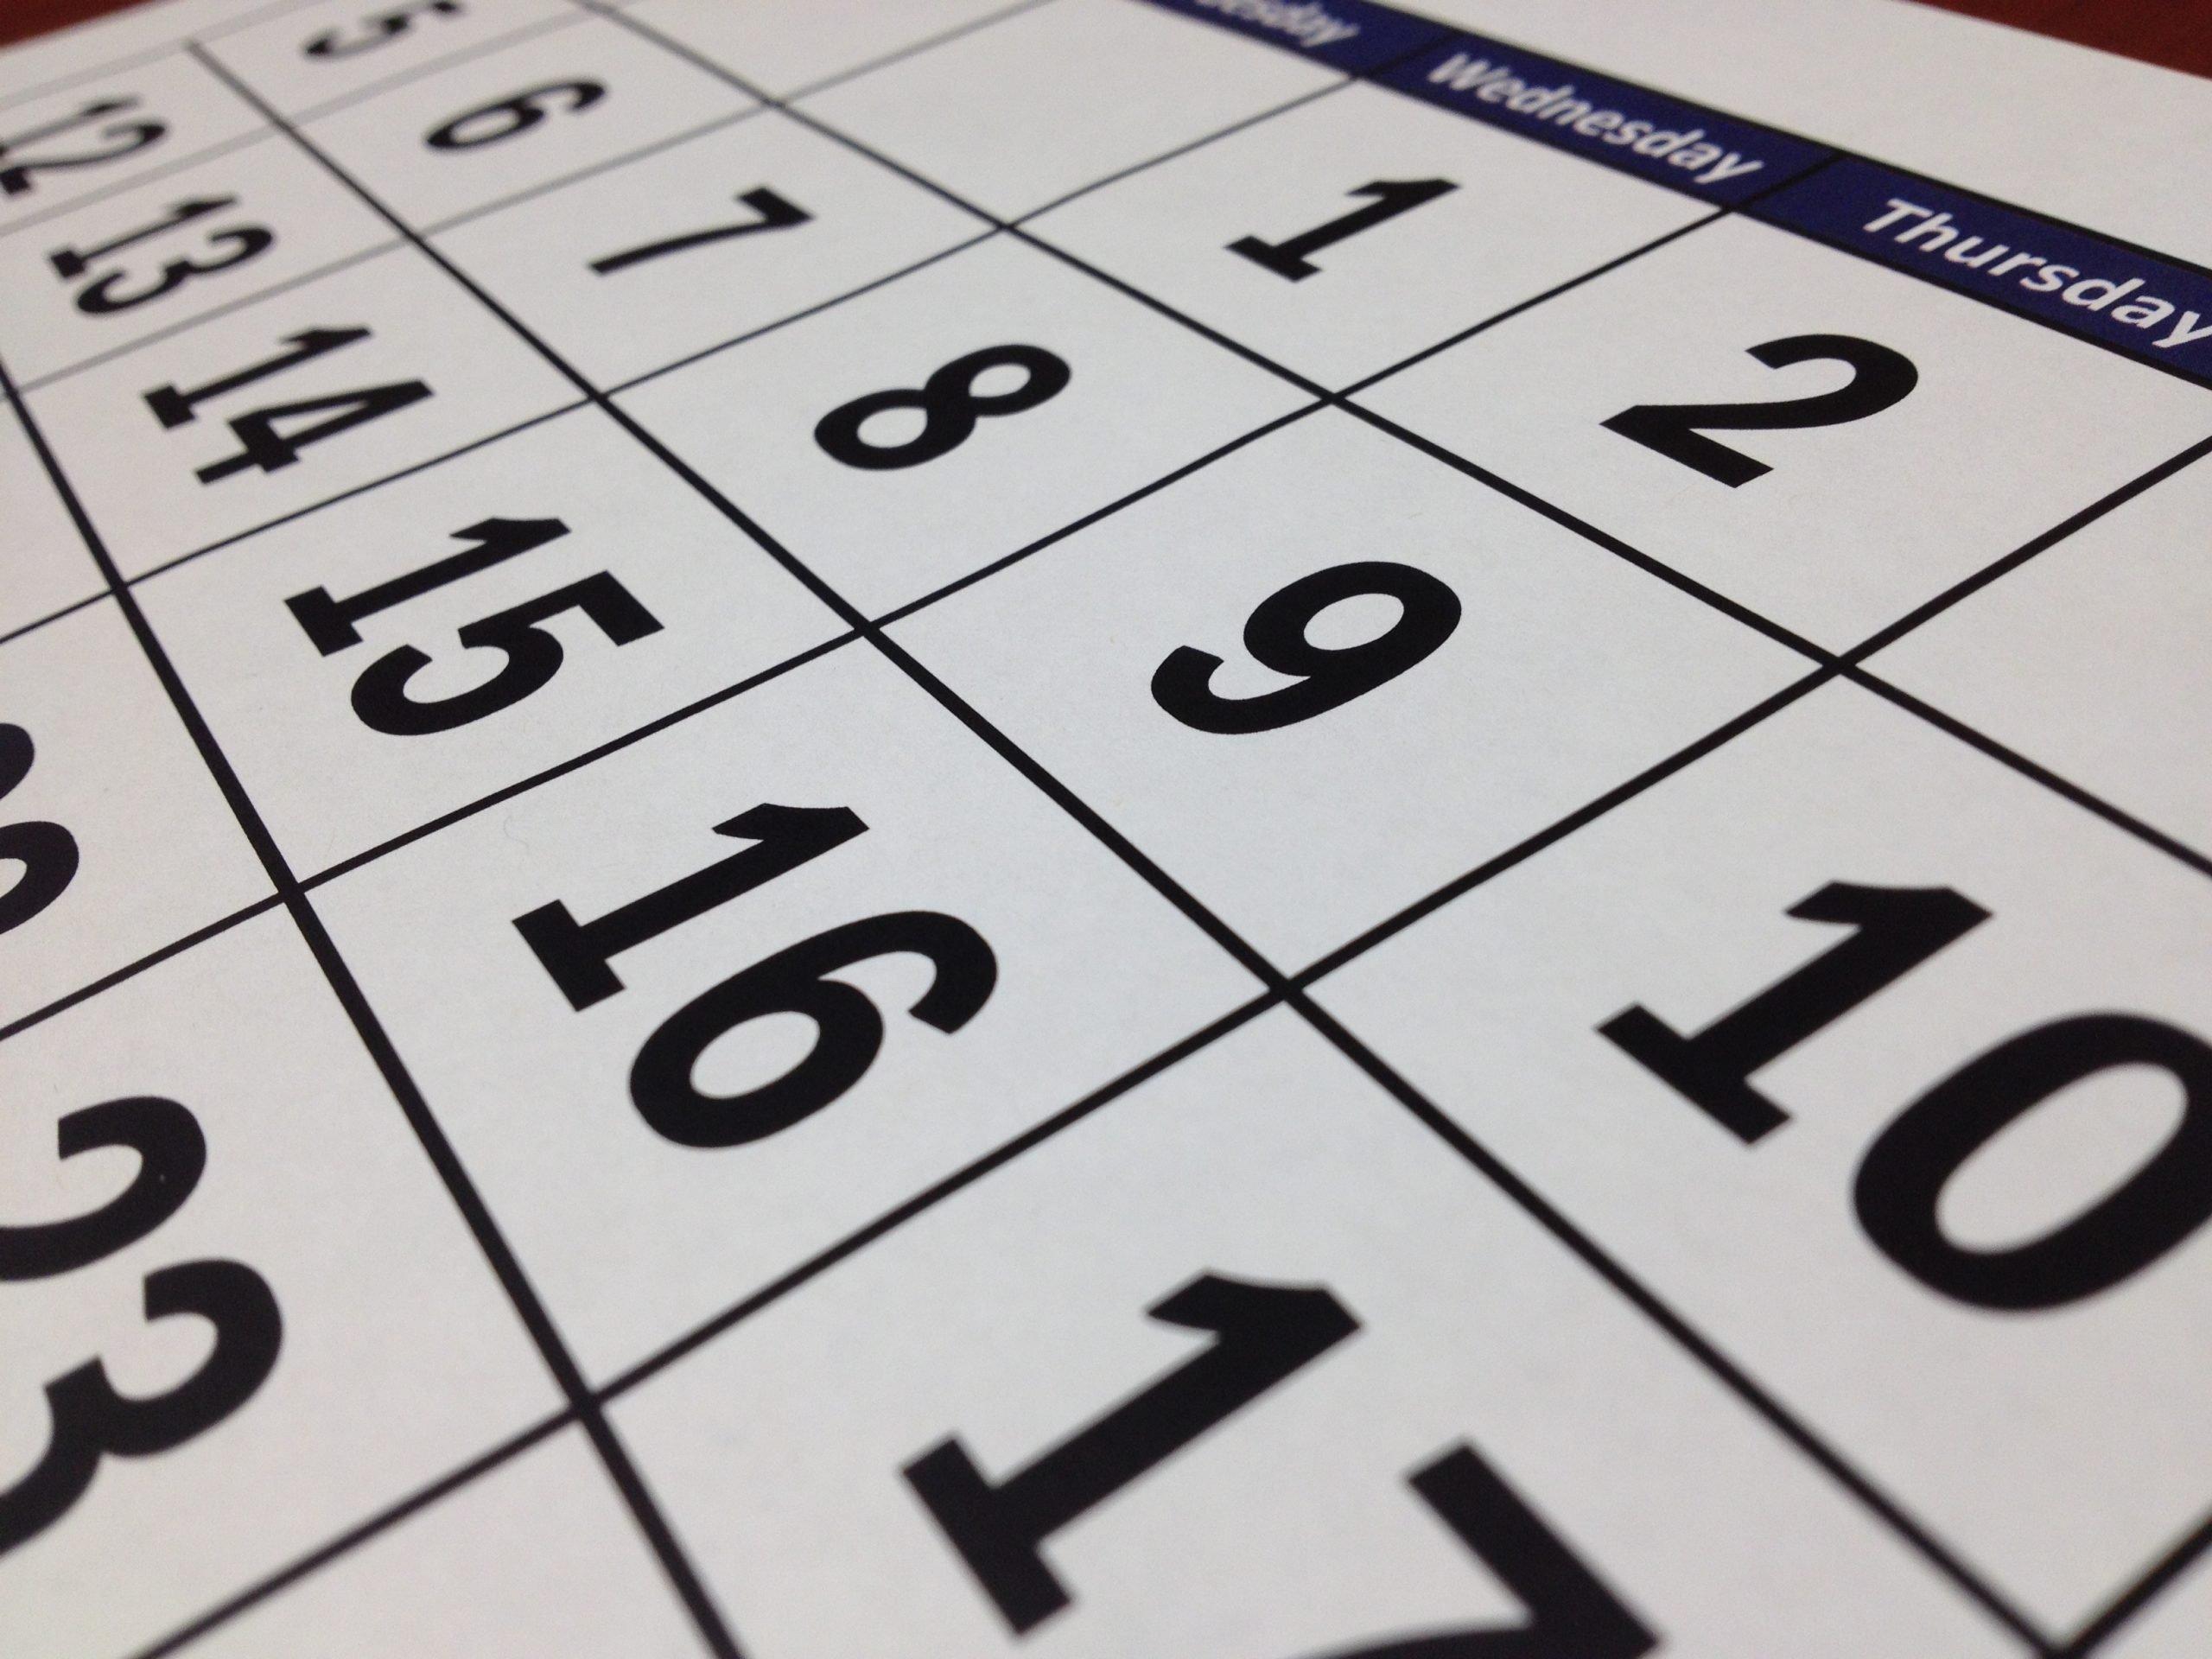 Close up of a calendar symbolizing the IPEDS schedule